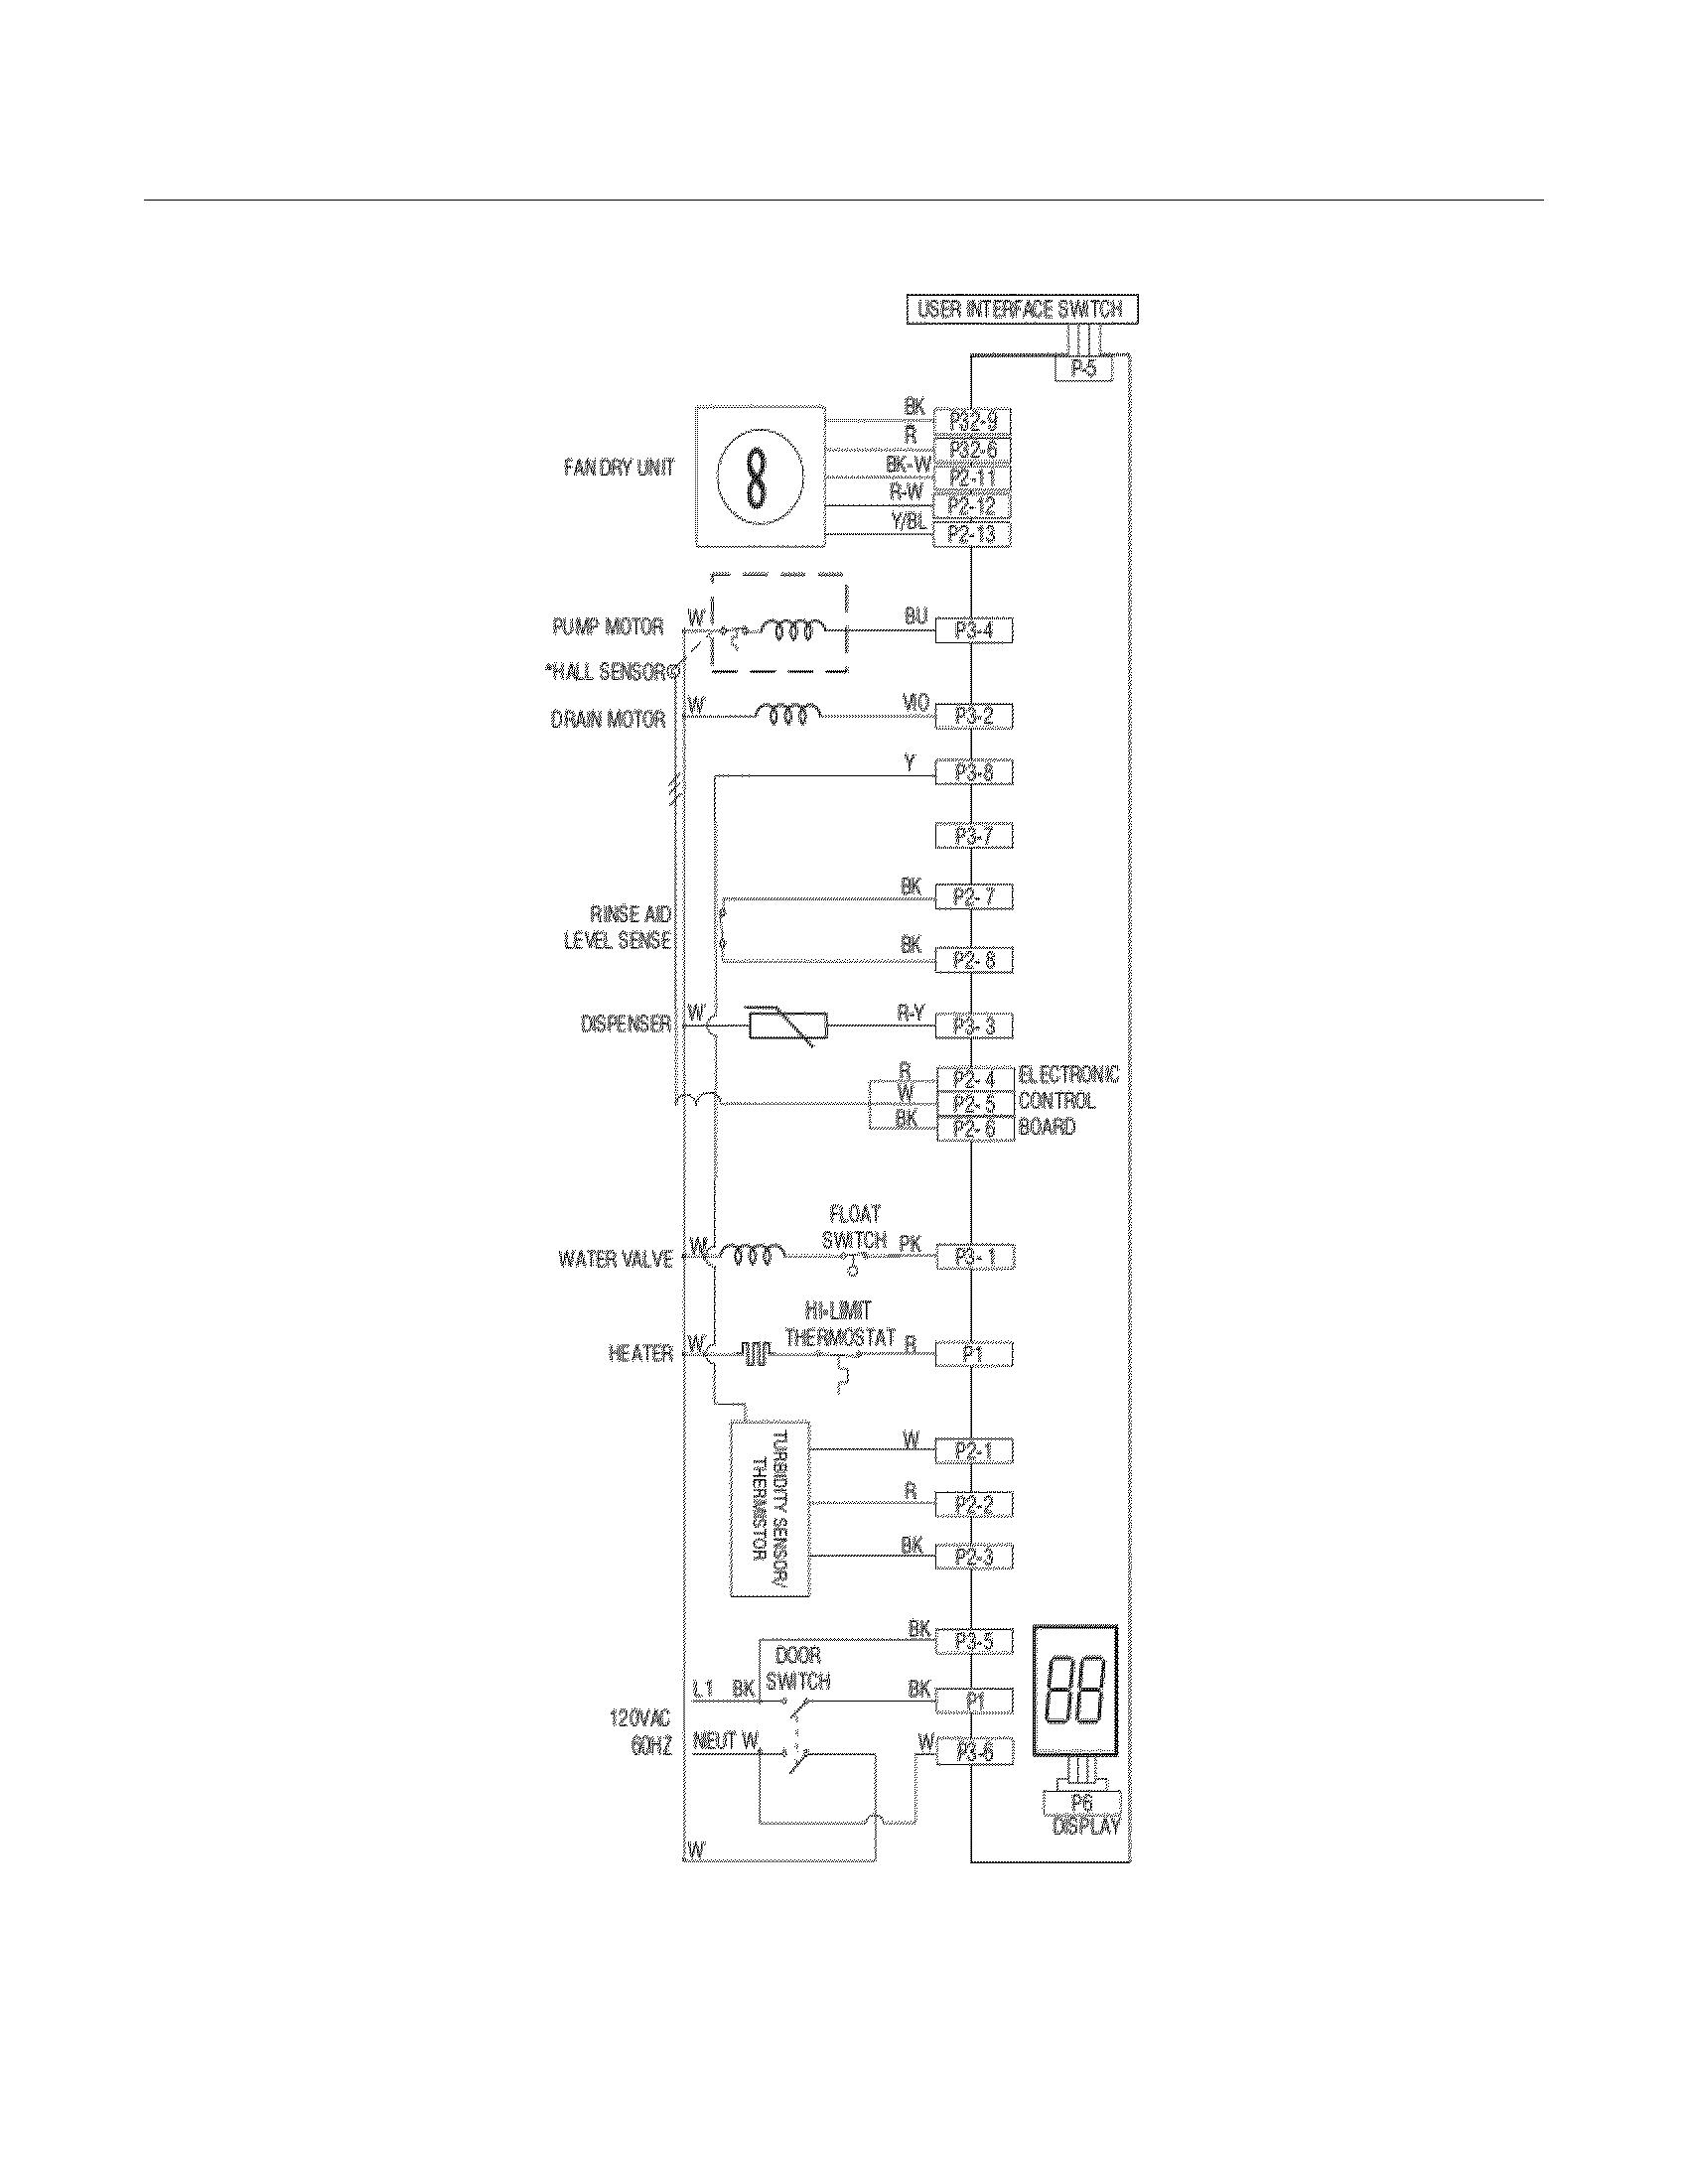 hight resolution of frigidaire fghd2465nw1a wiring diagram diagram